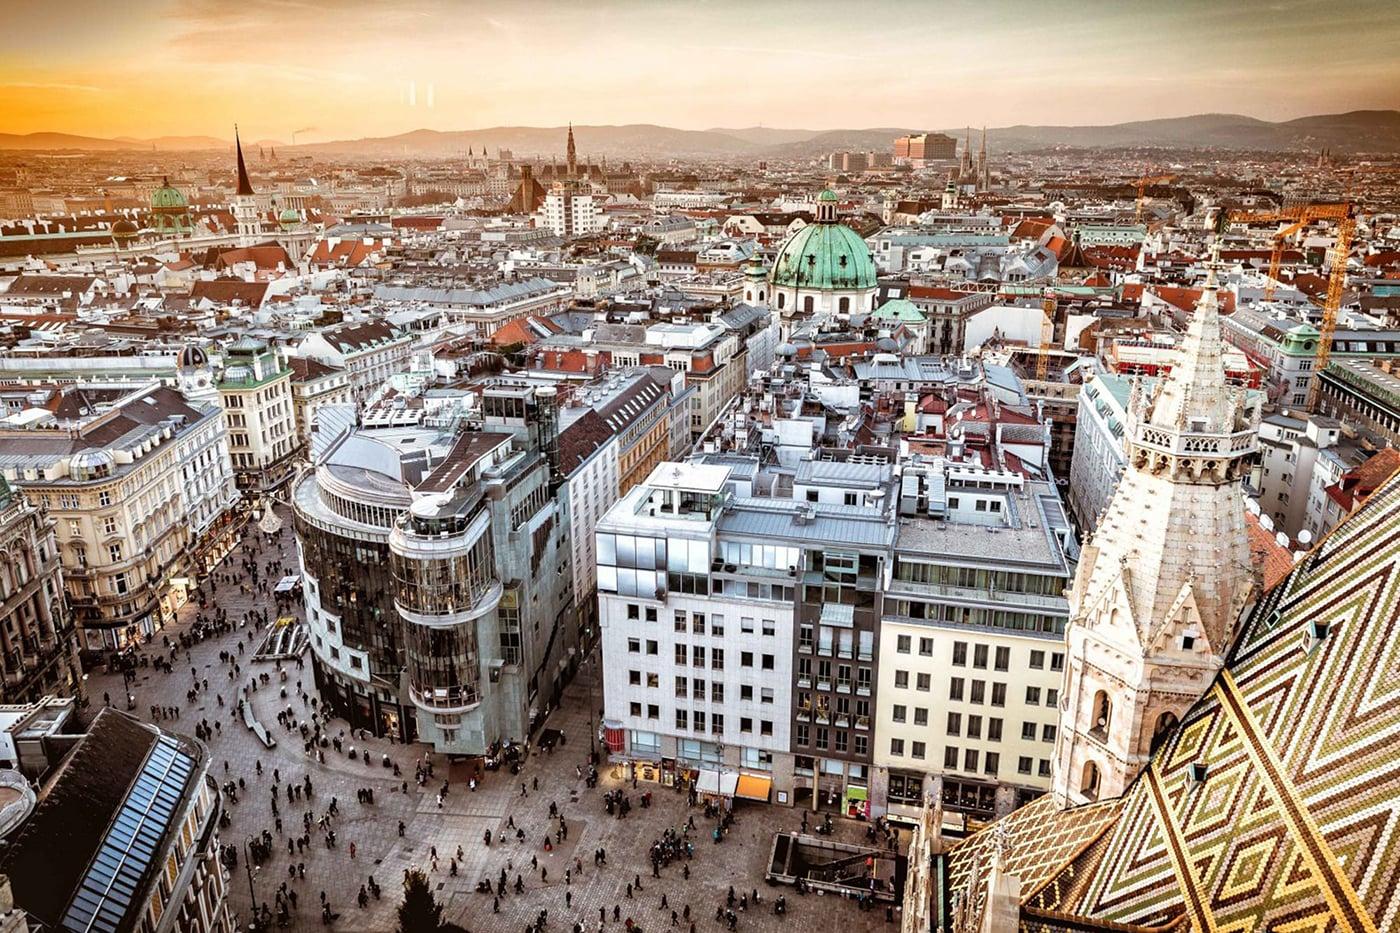 https://www.capitalonstage.com/wp-content/uploads/2017/06/Vienna.jpg